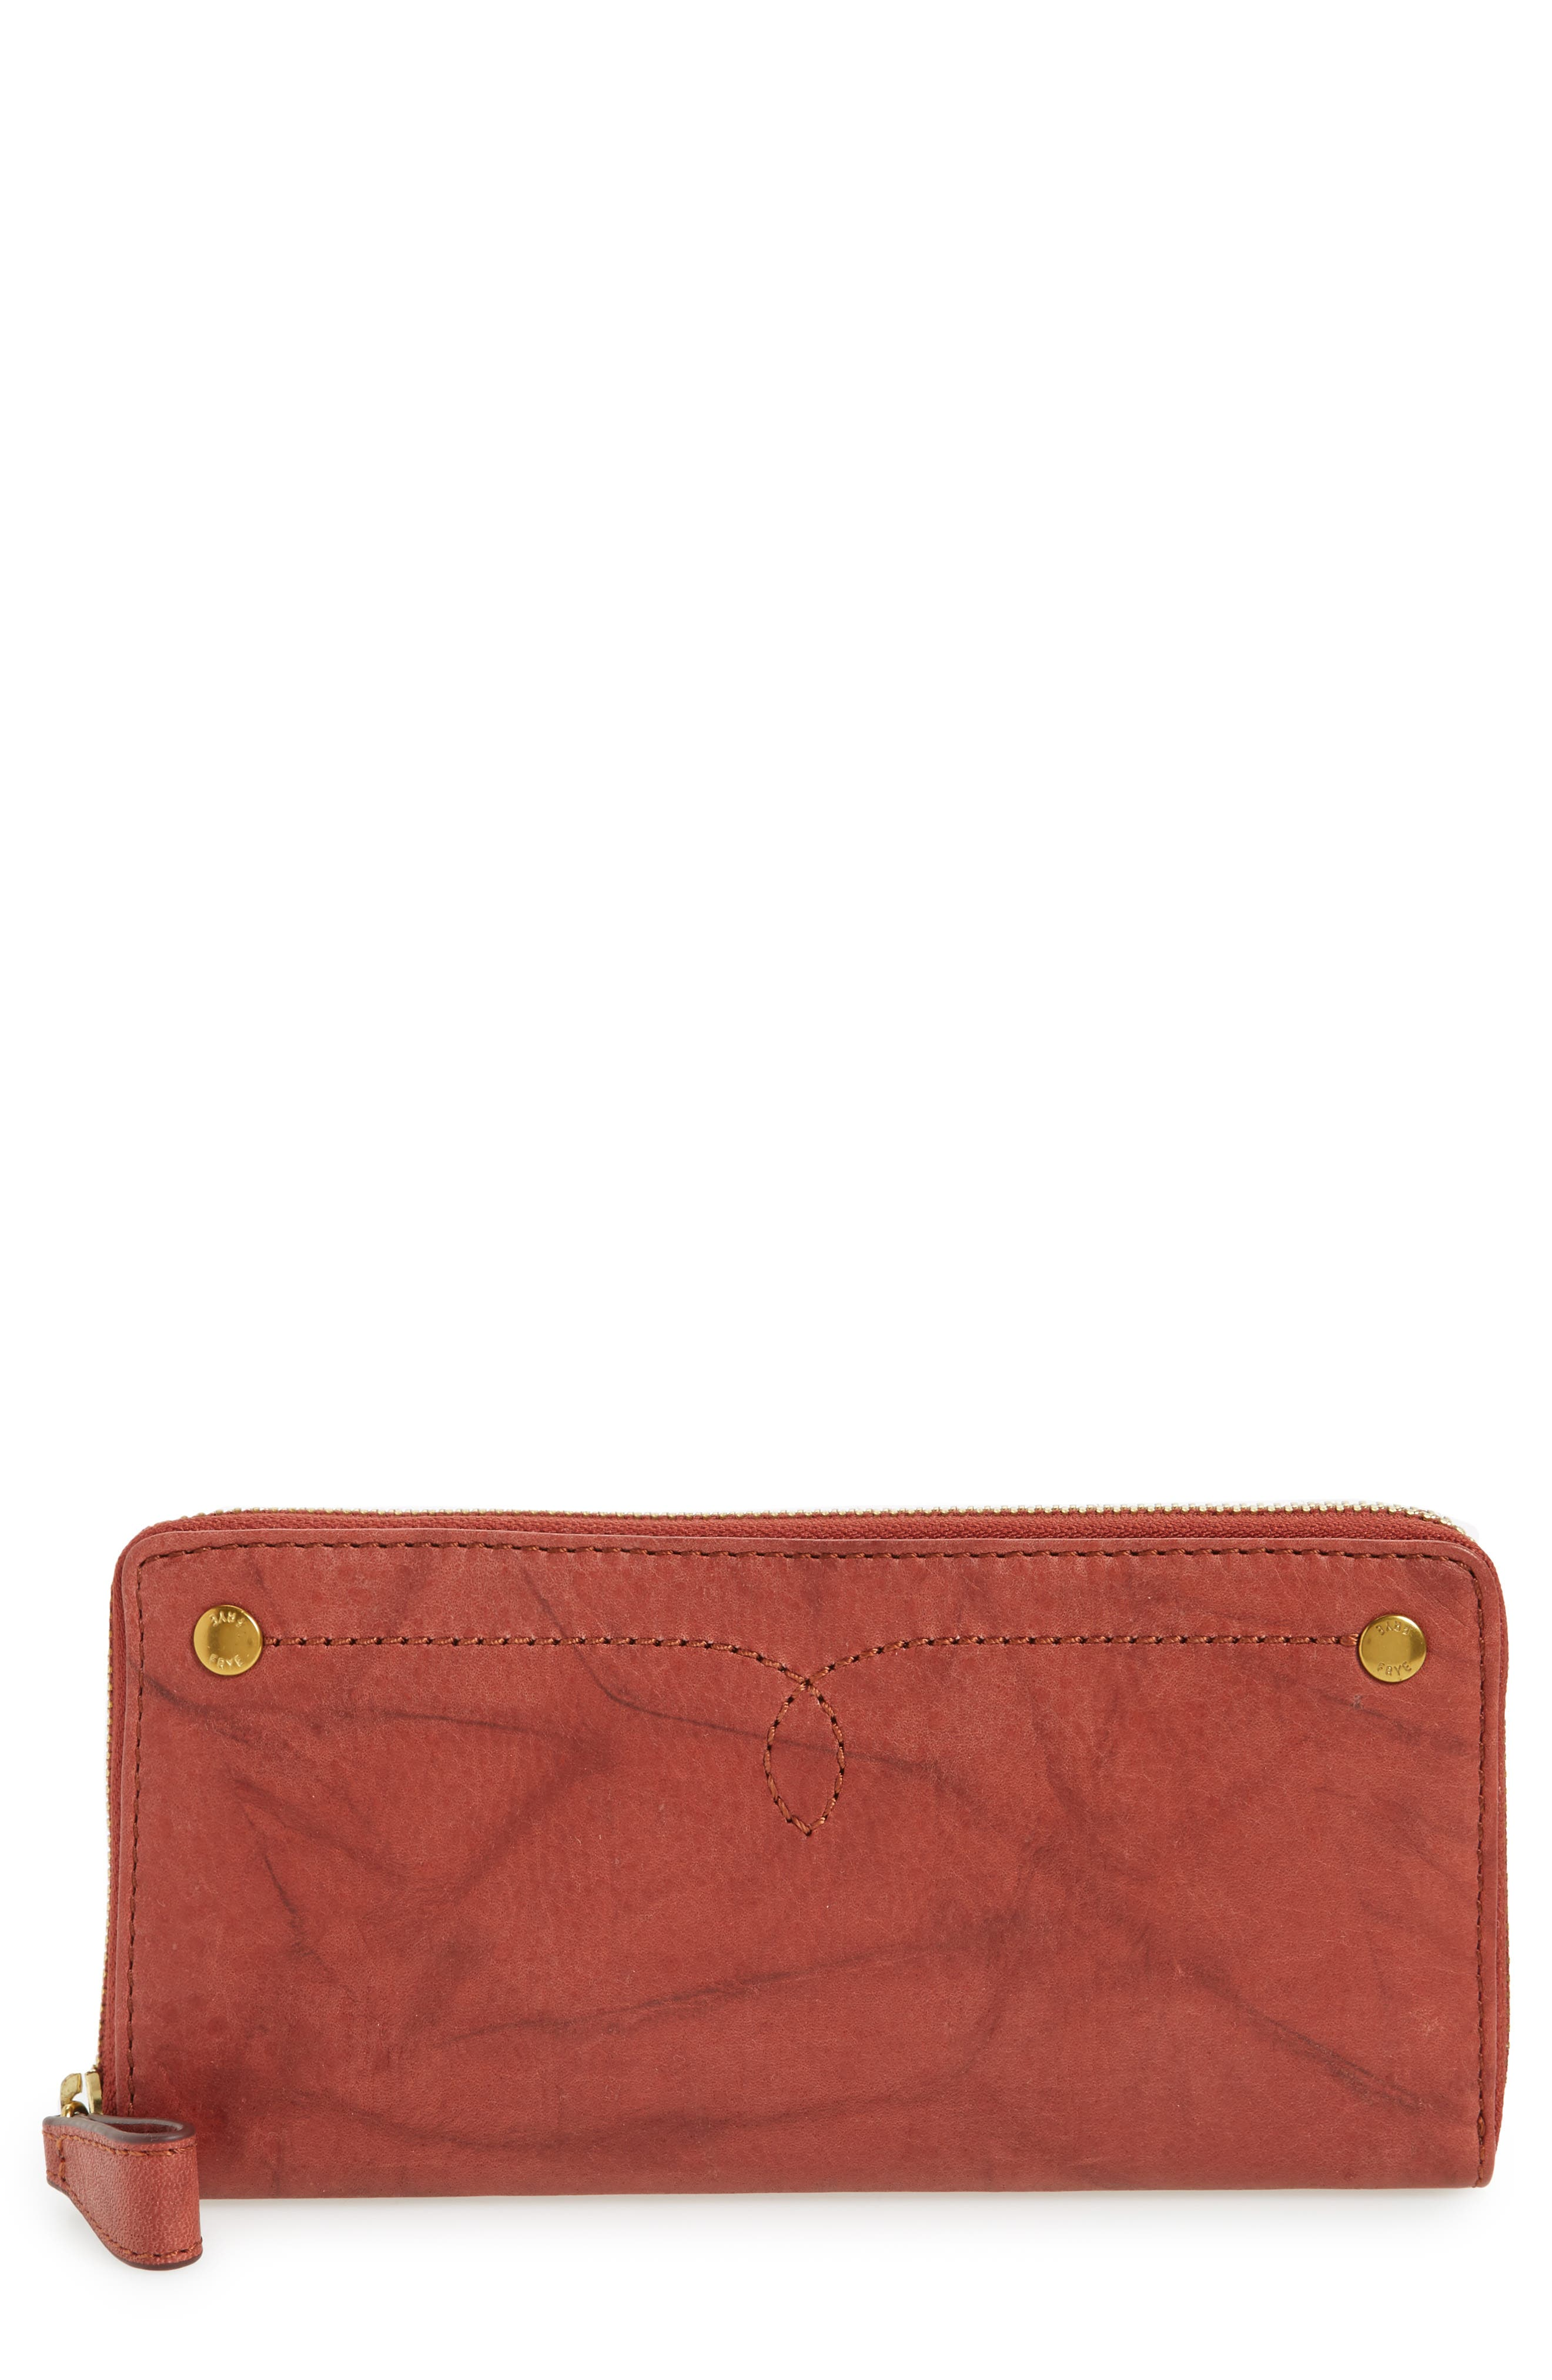 Frye Campus Rivet Leather Continental Zip Wallet